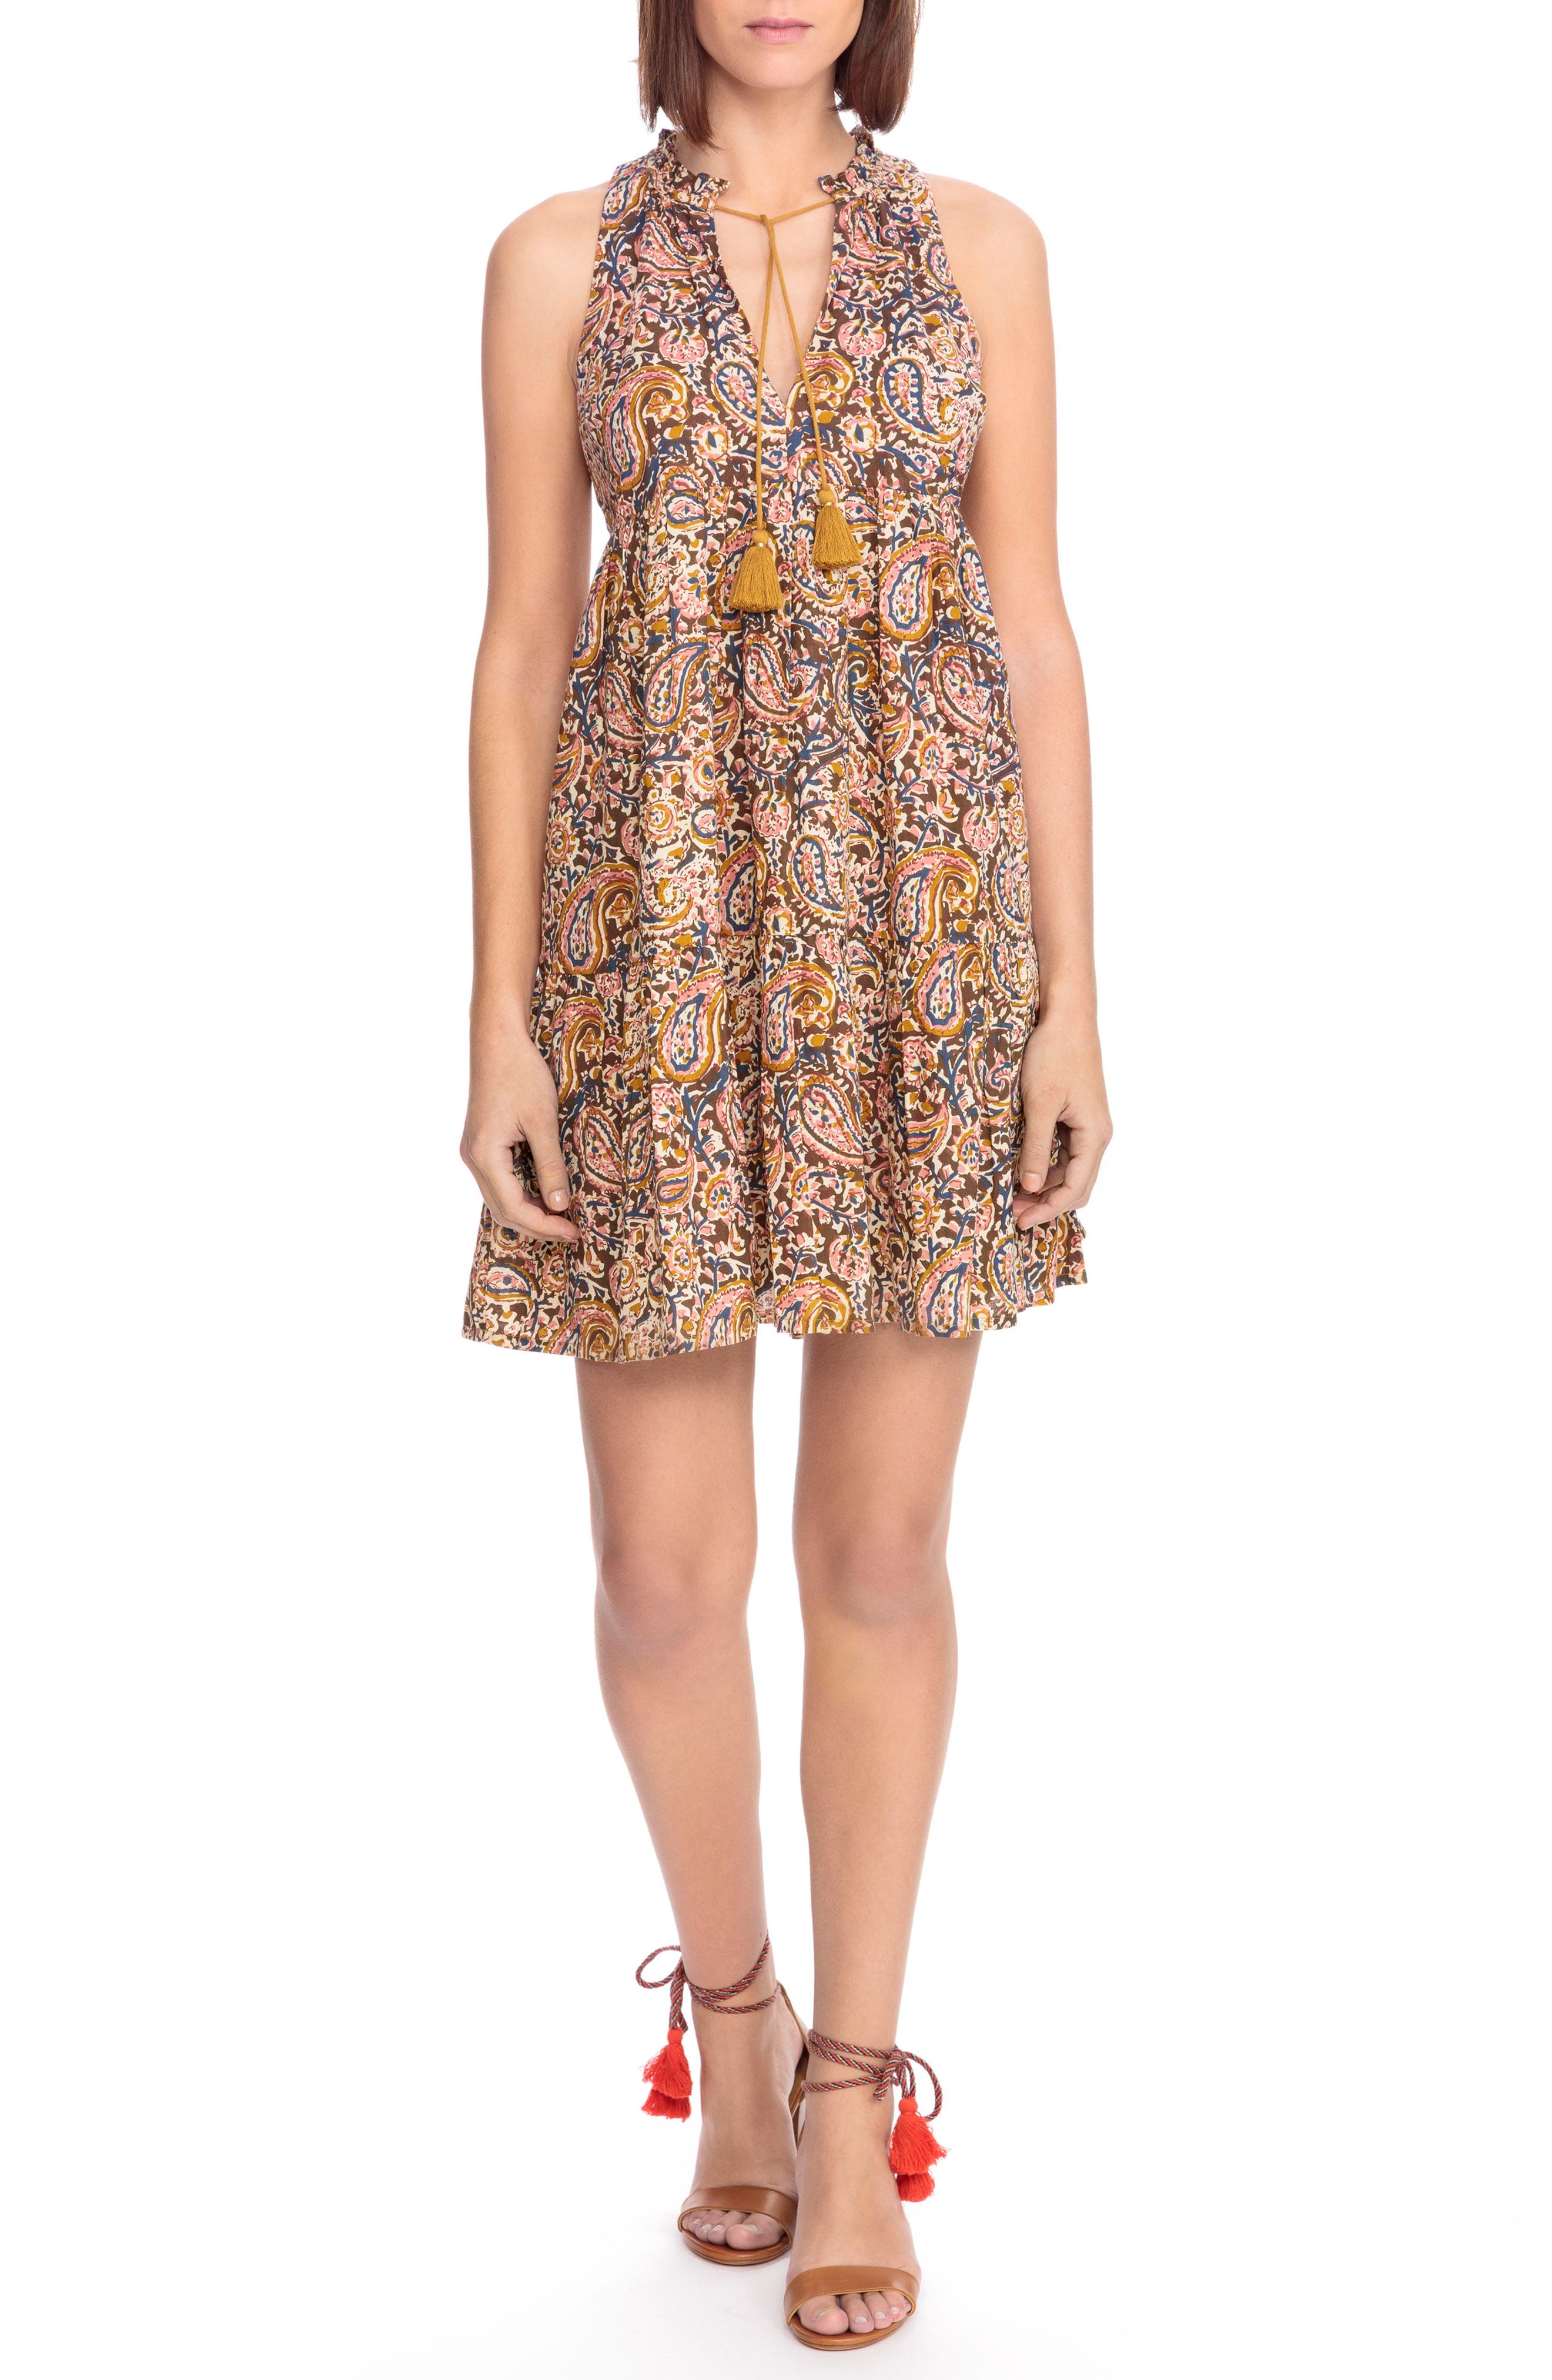 Sézane Arielle Paisley A-Line Dress